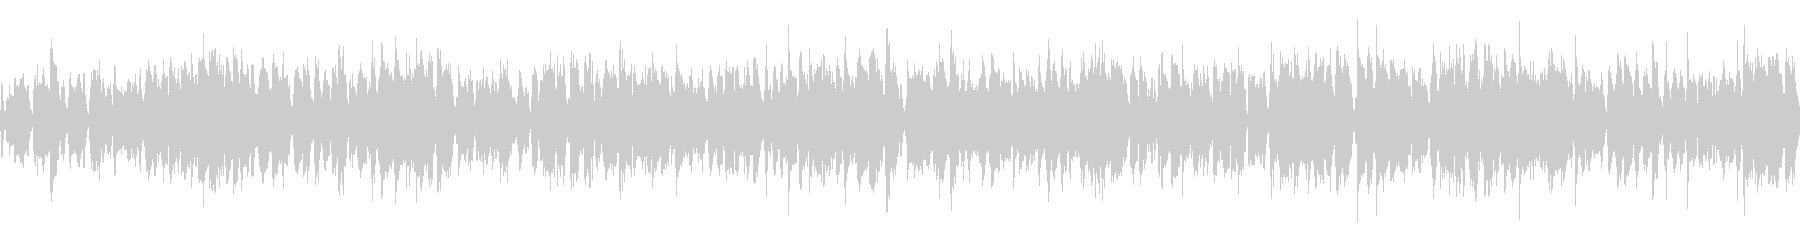 Nu-Jazzです。1分9秒、ループ可の未再生の波形